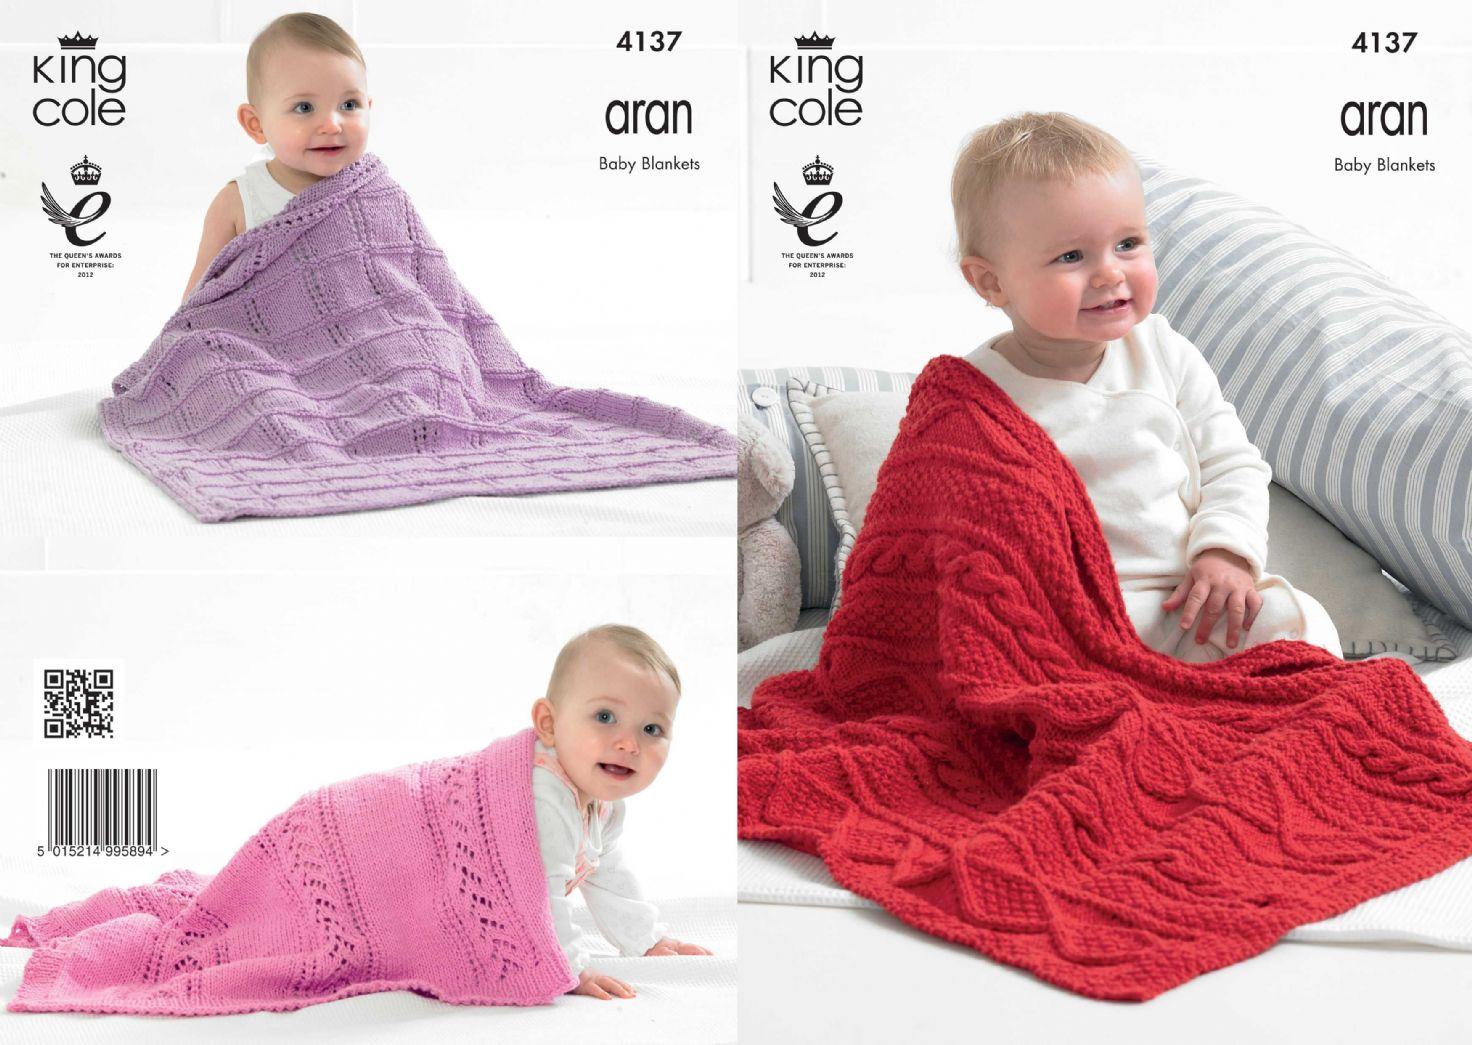 Aran Knitting Pattern Baby Blanket : 4137 - KING COLE BIG VALUE RECYCLED COTTON ARAN BABY ...